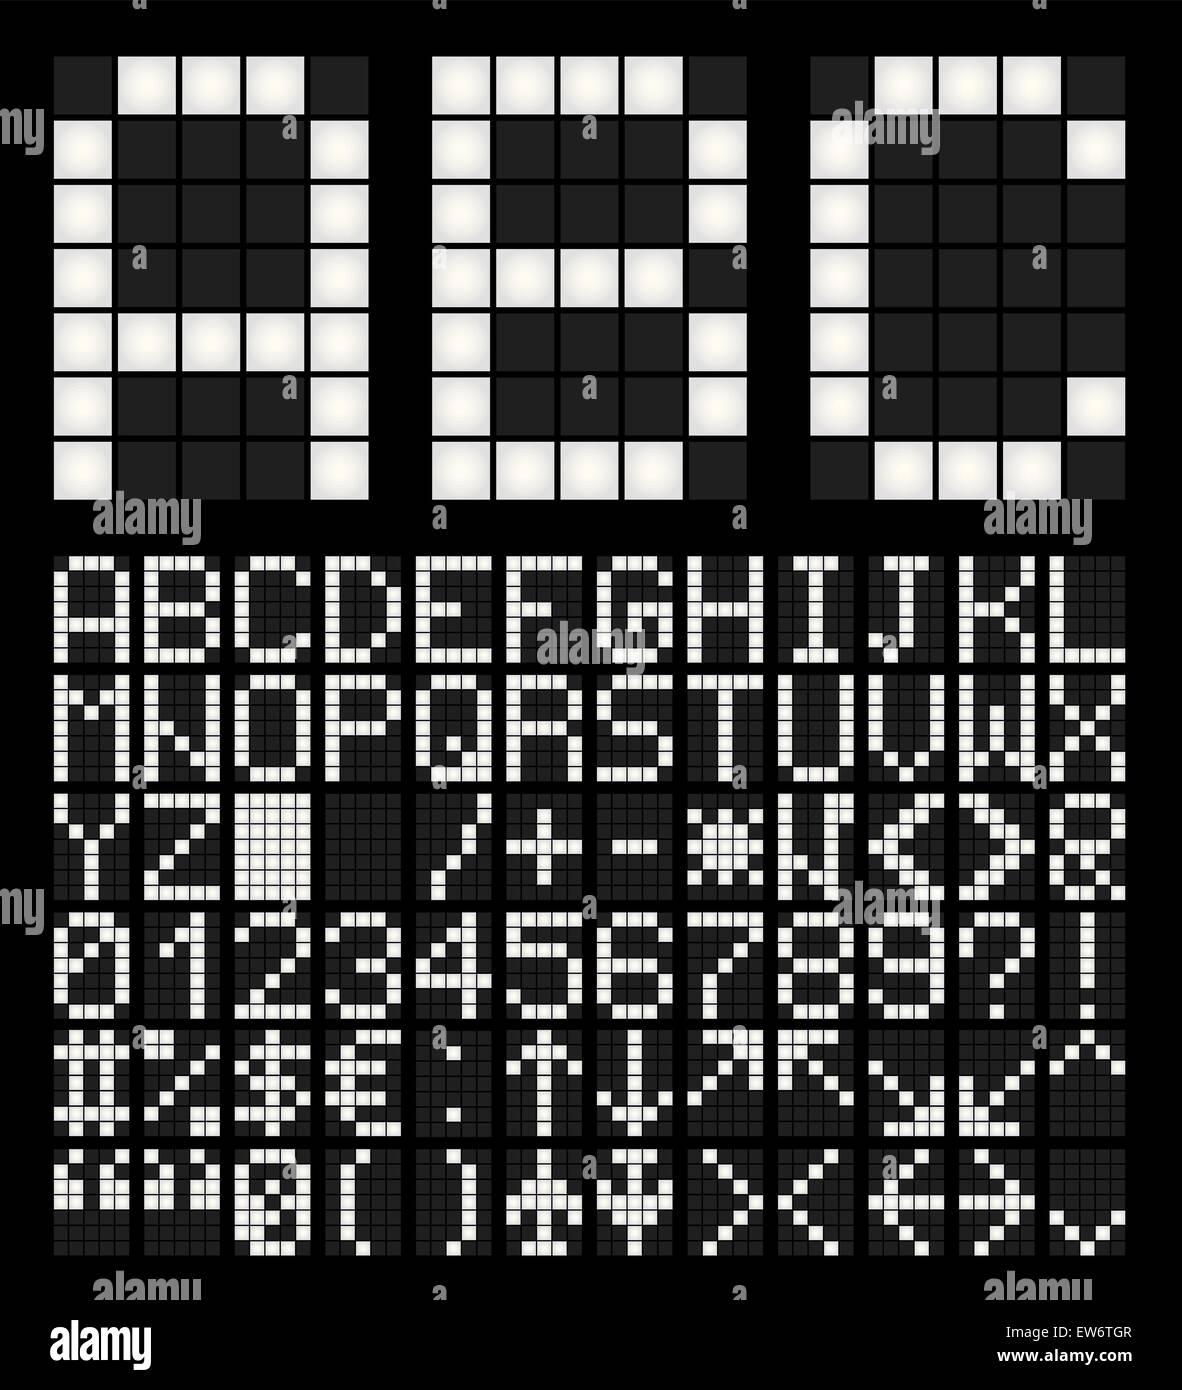 8 bit font - Stock Image